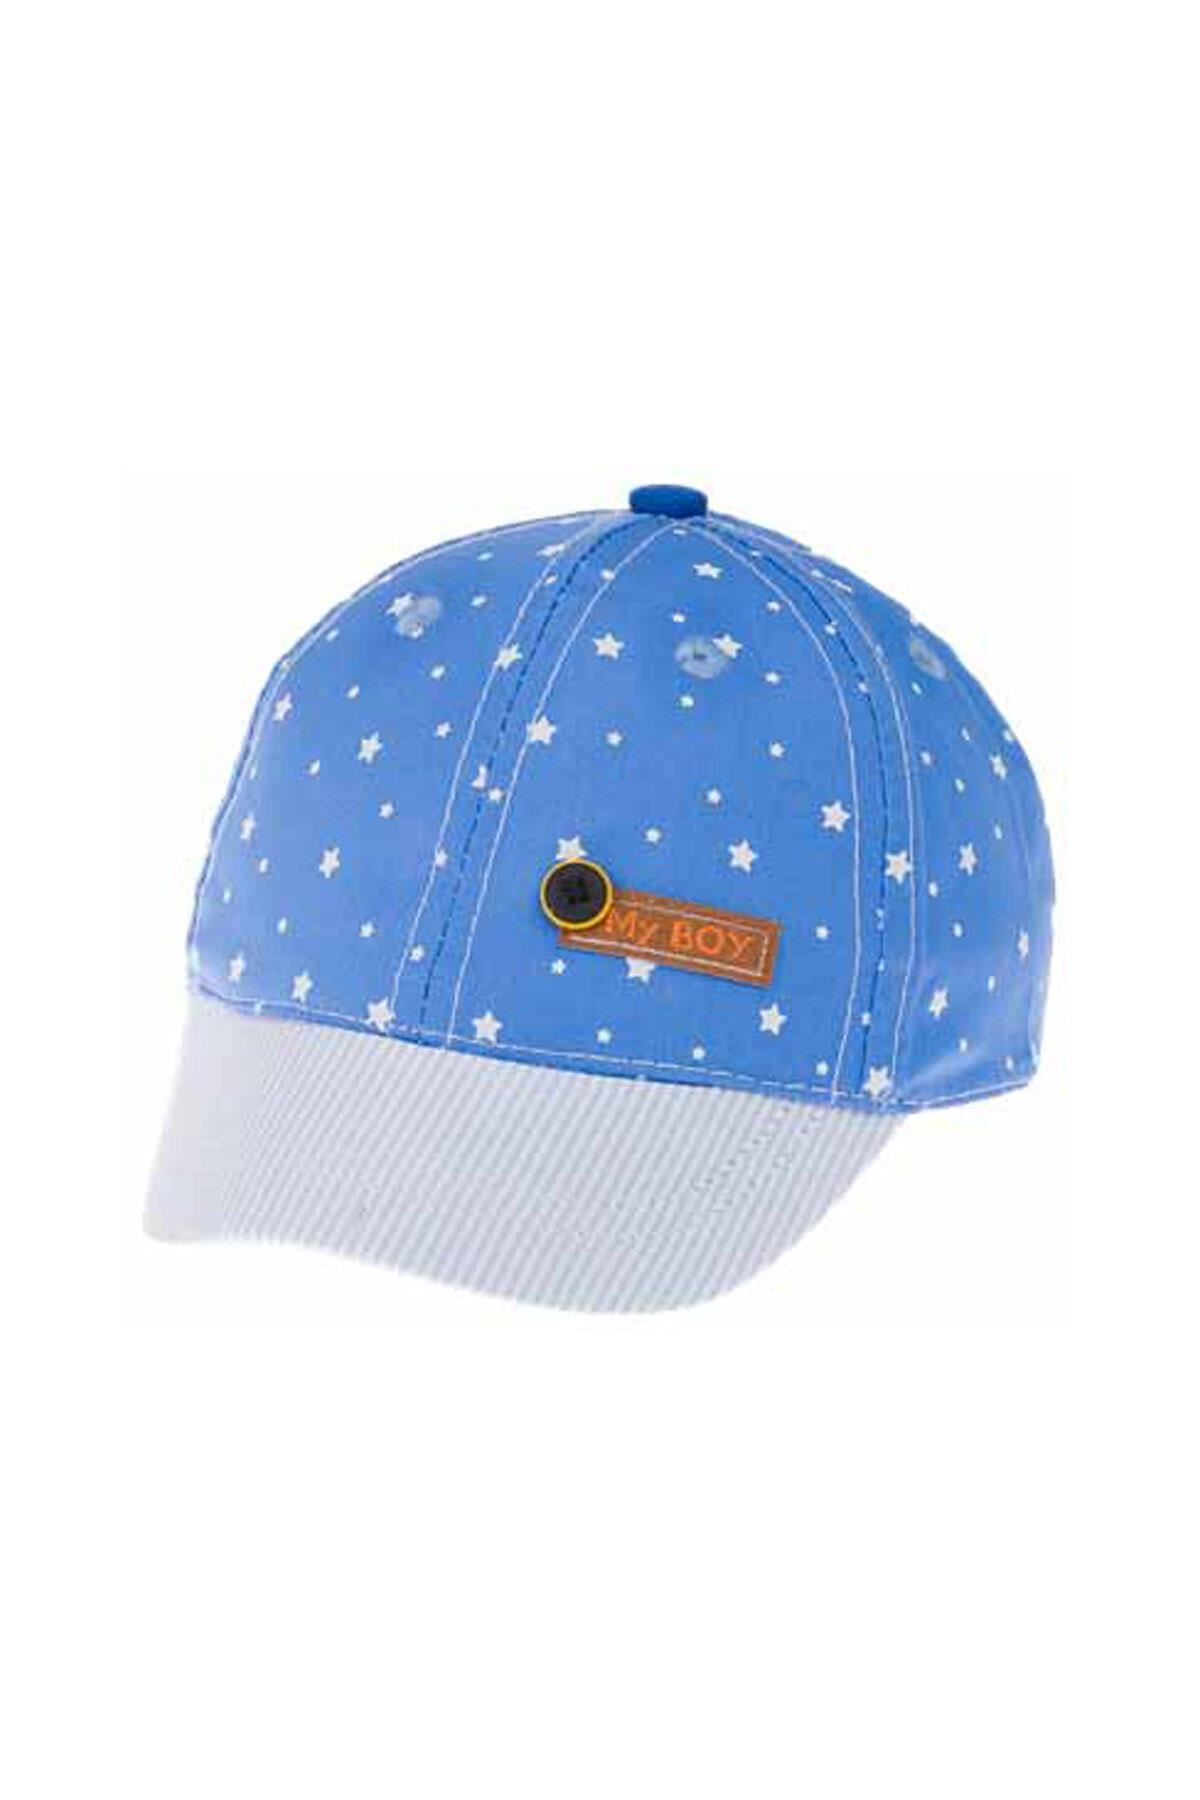 Kitti Aylık Erkek Şapka (0-18 Ay) 101004 Mavi